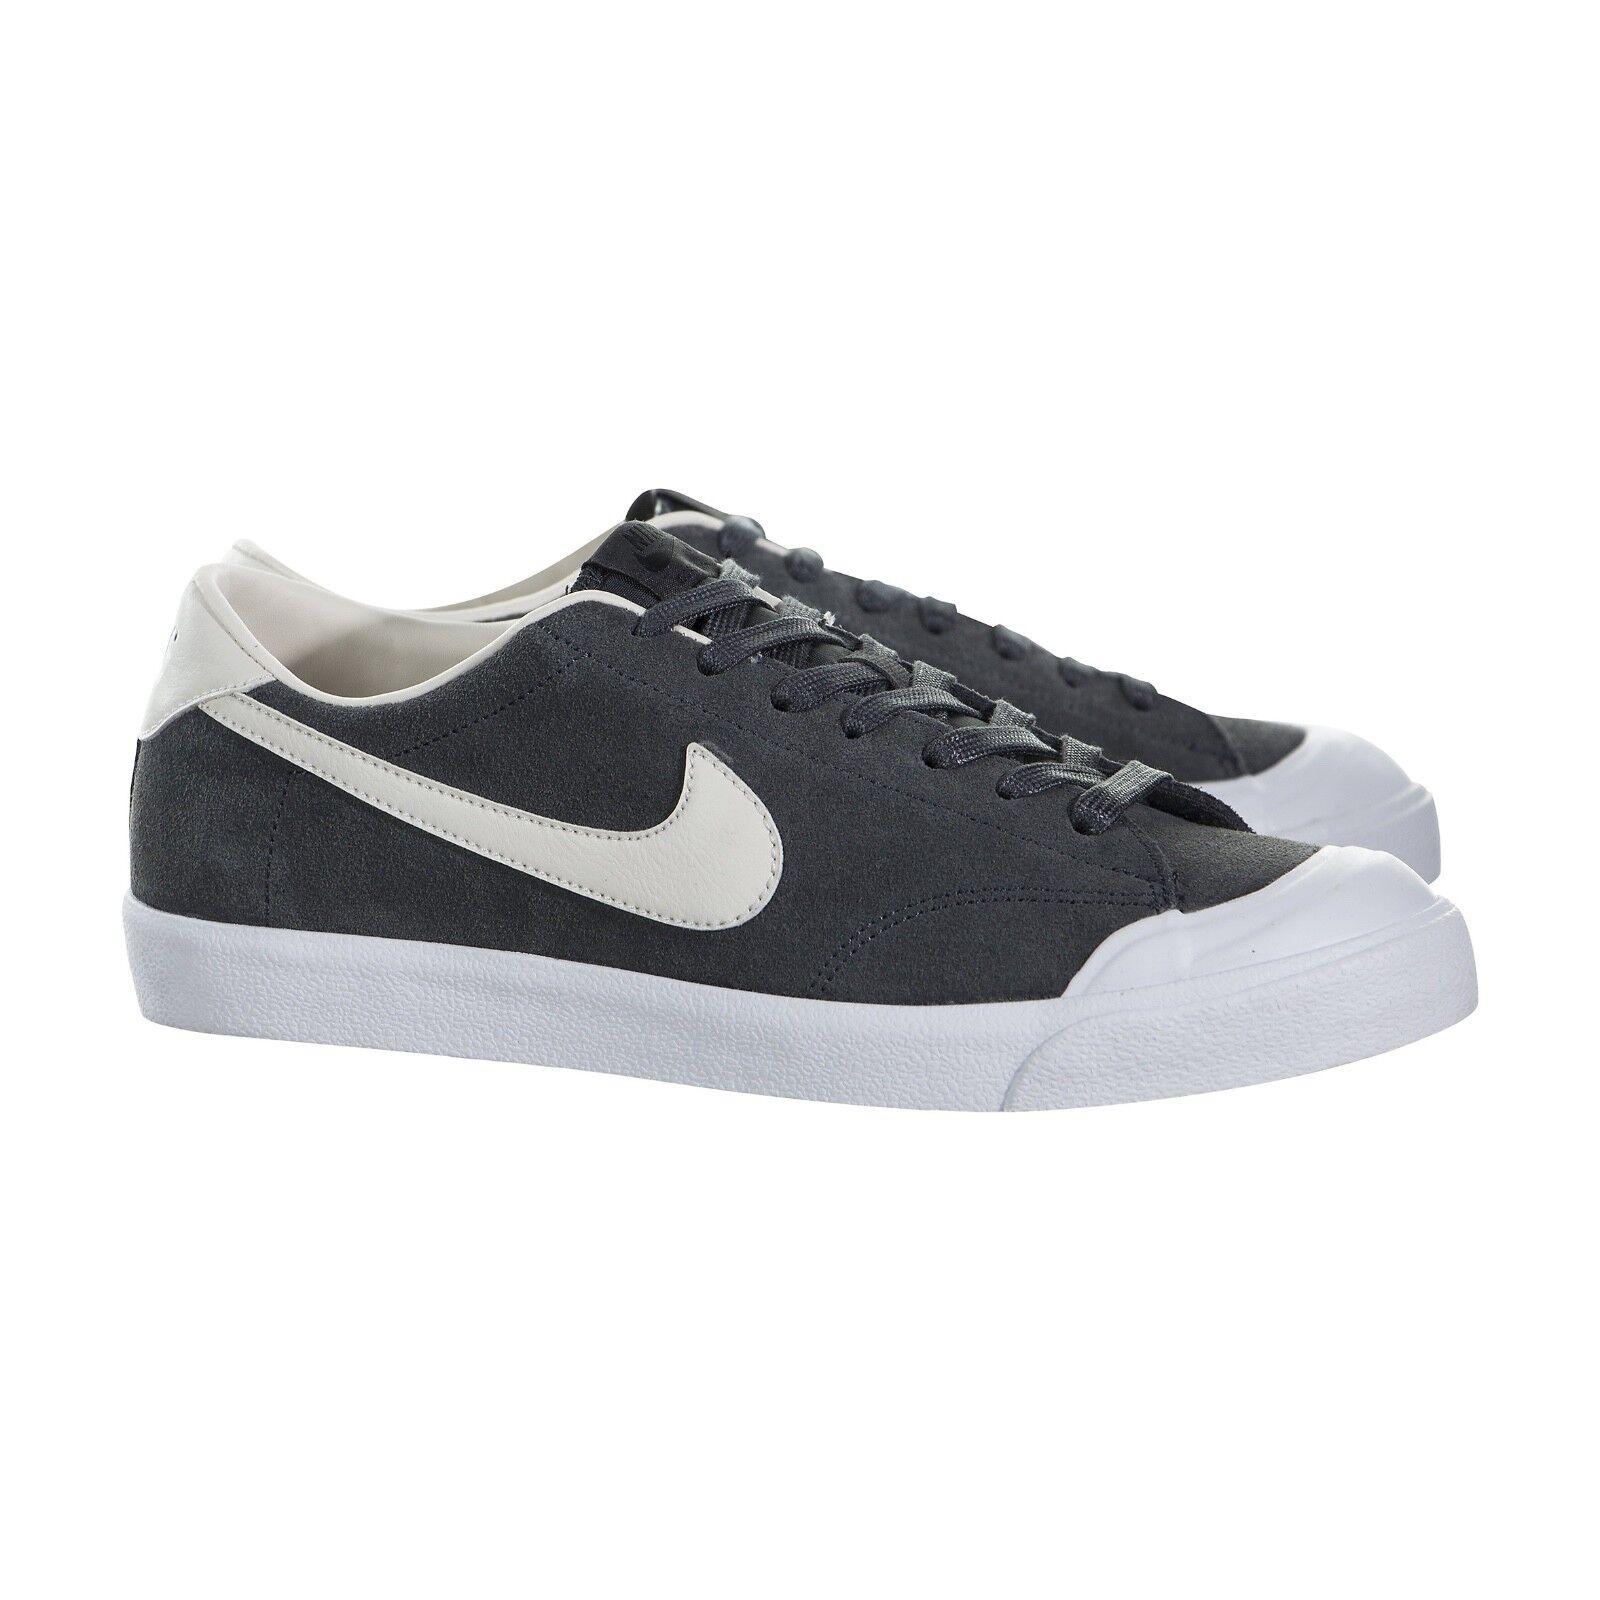 Nike Trainers Sb Zoom All Court Trainers Nike Black/White 0b701d